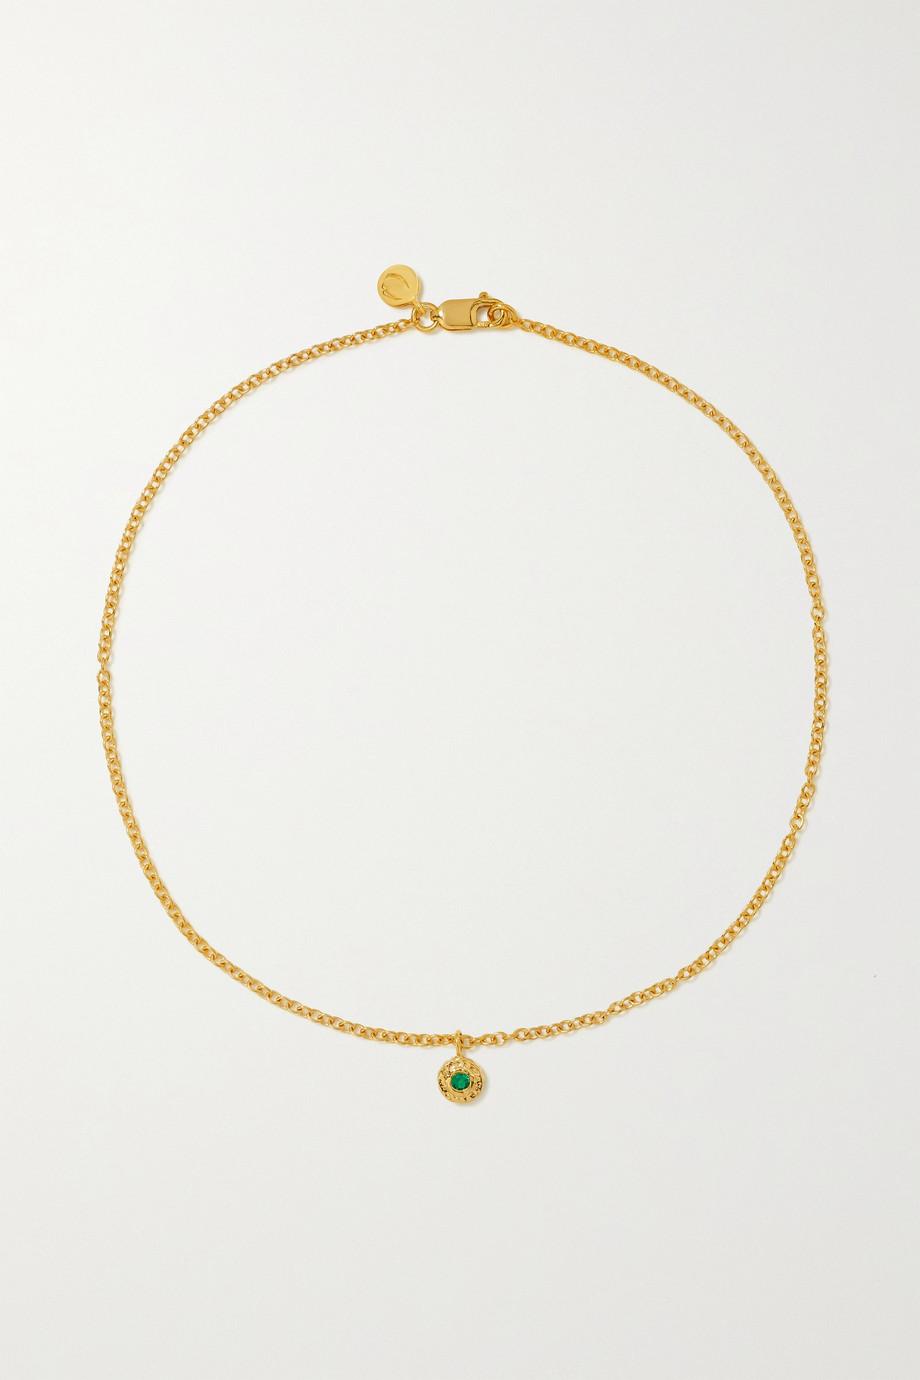 Octavia Elizabeth + NET SUSTAIN Nesting Gem 18-karat recycled gold emerald anklet